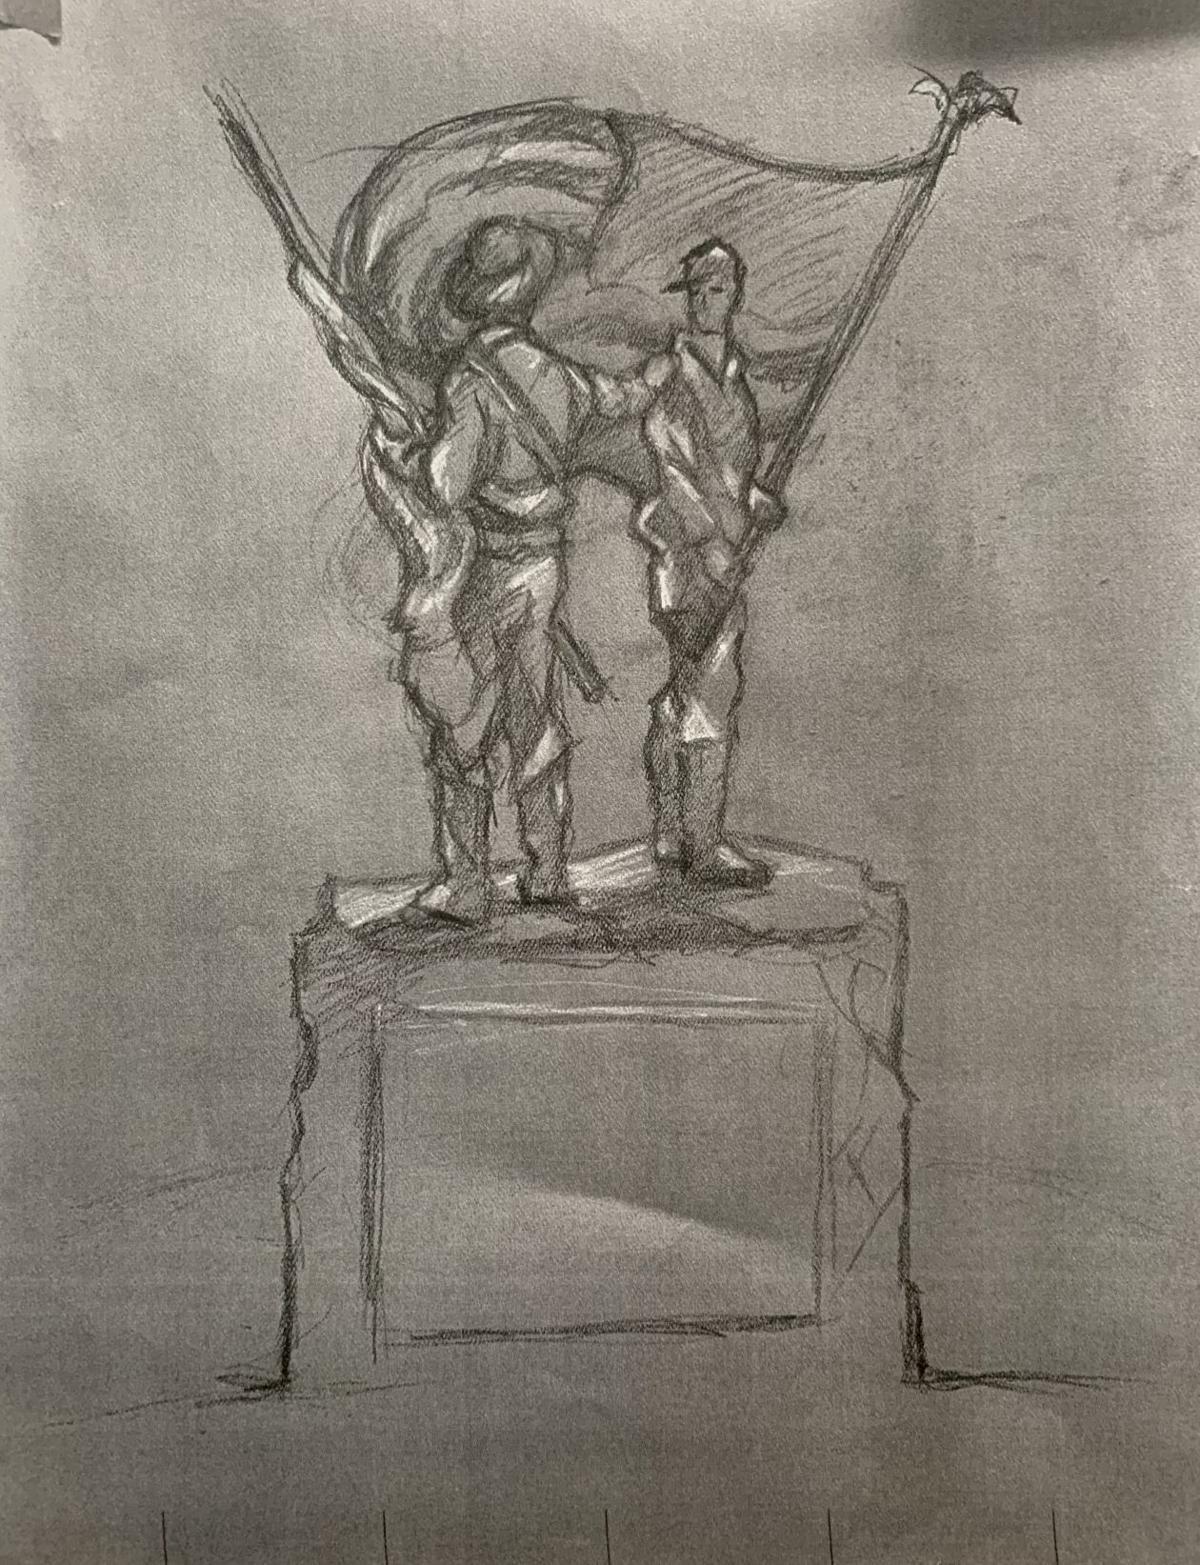 Council debates new statue depicting both sides of Civil War